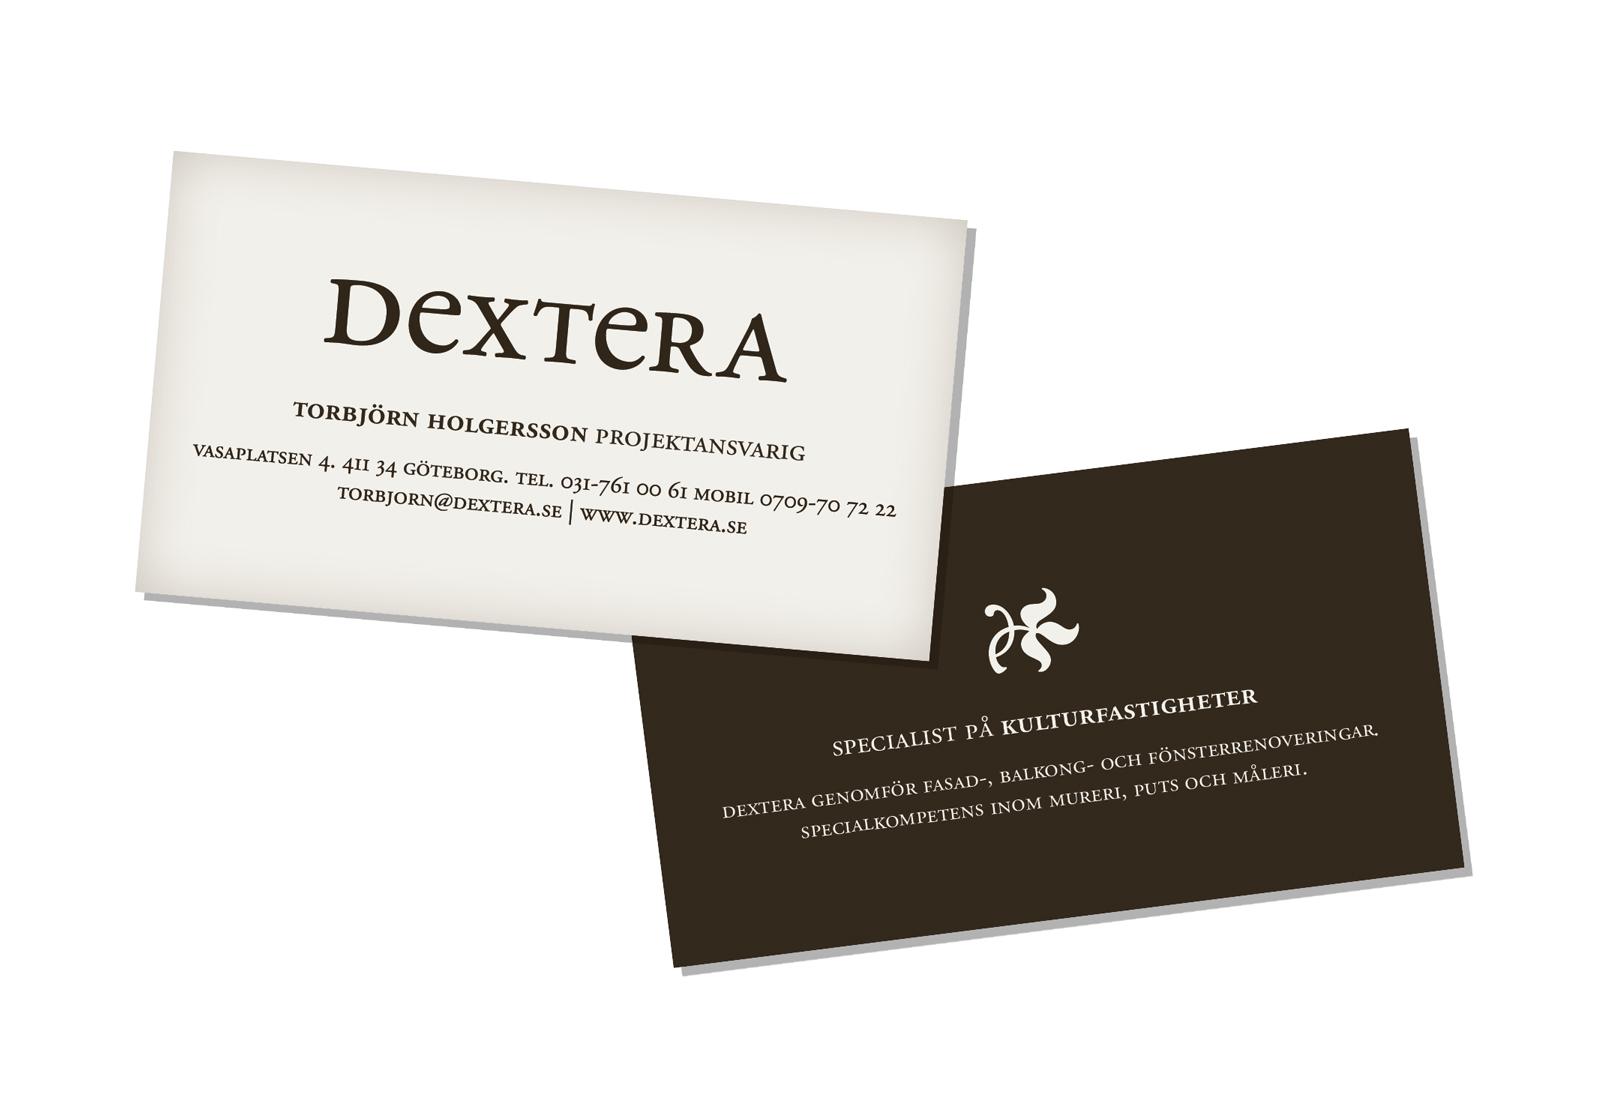 Dextera